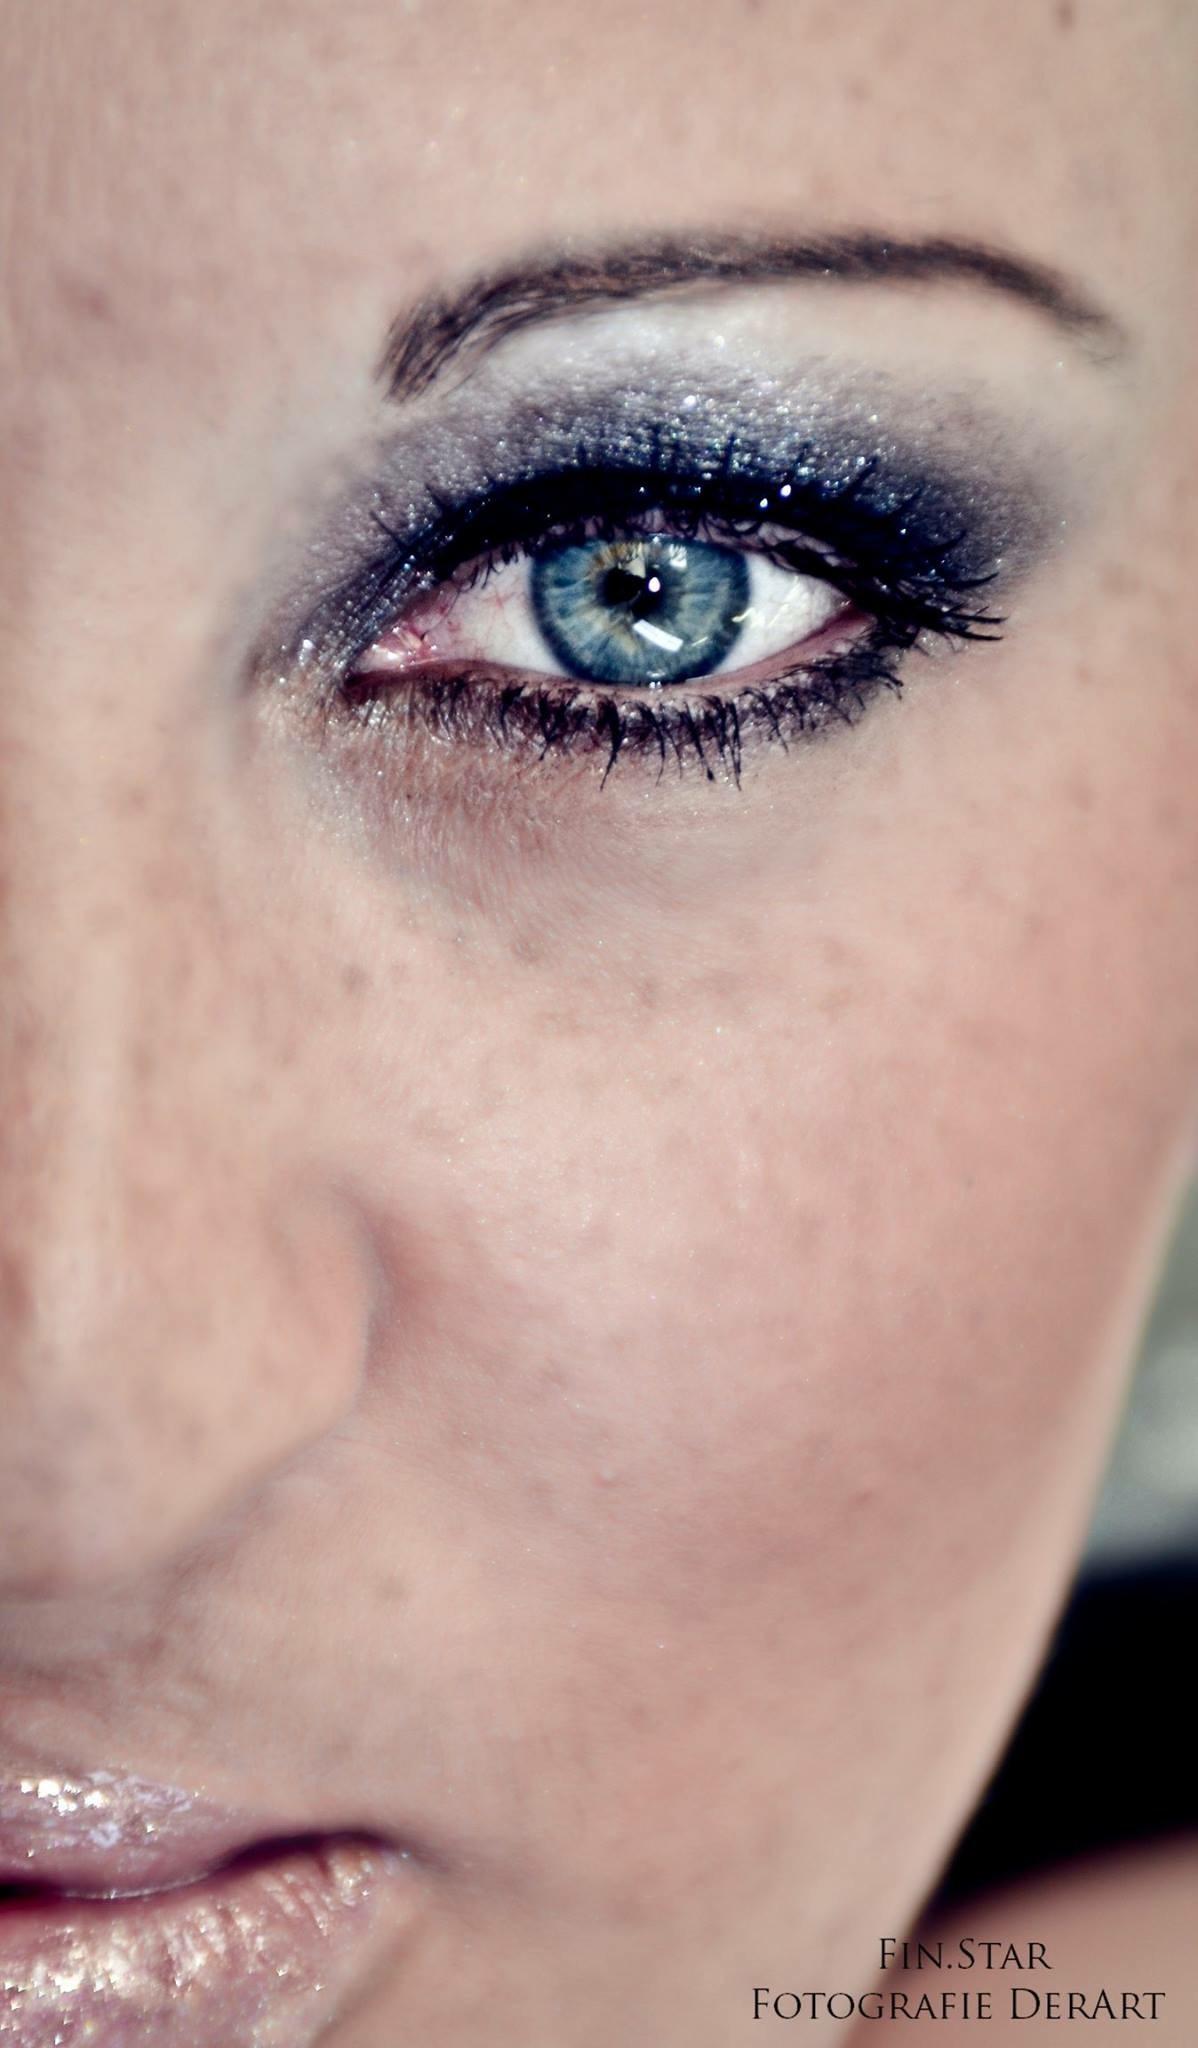 Face by F1n5tar